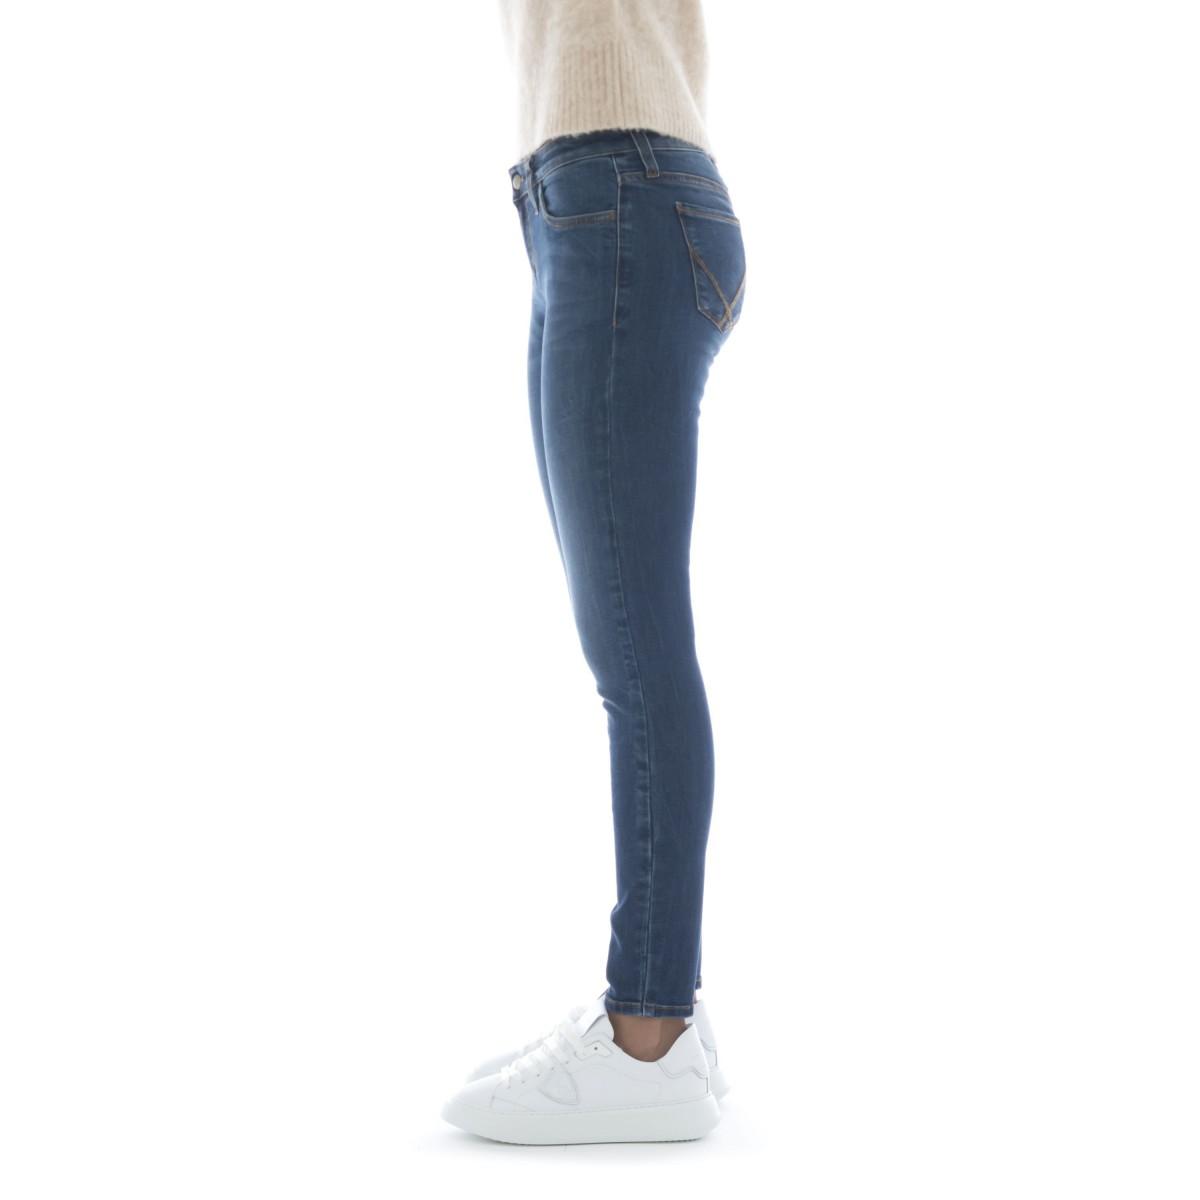 Jeans - Cate cut castries